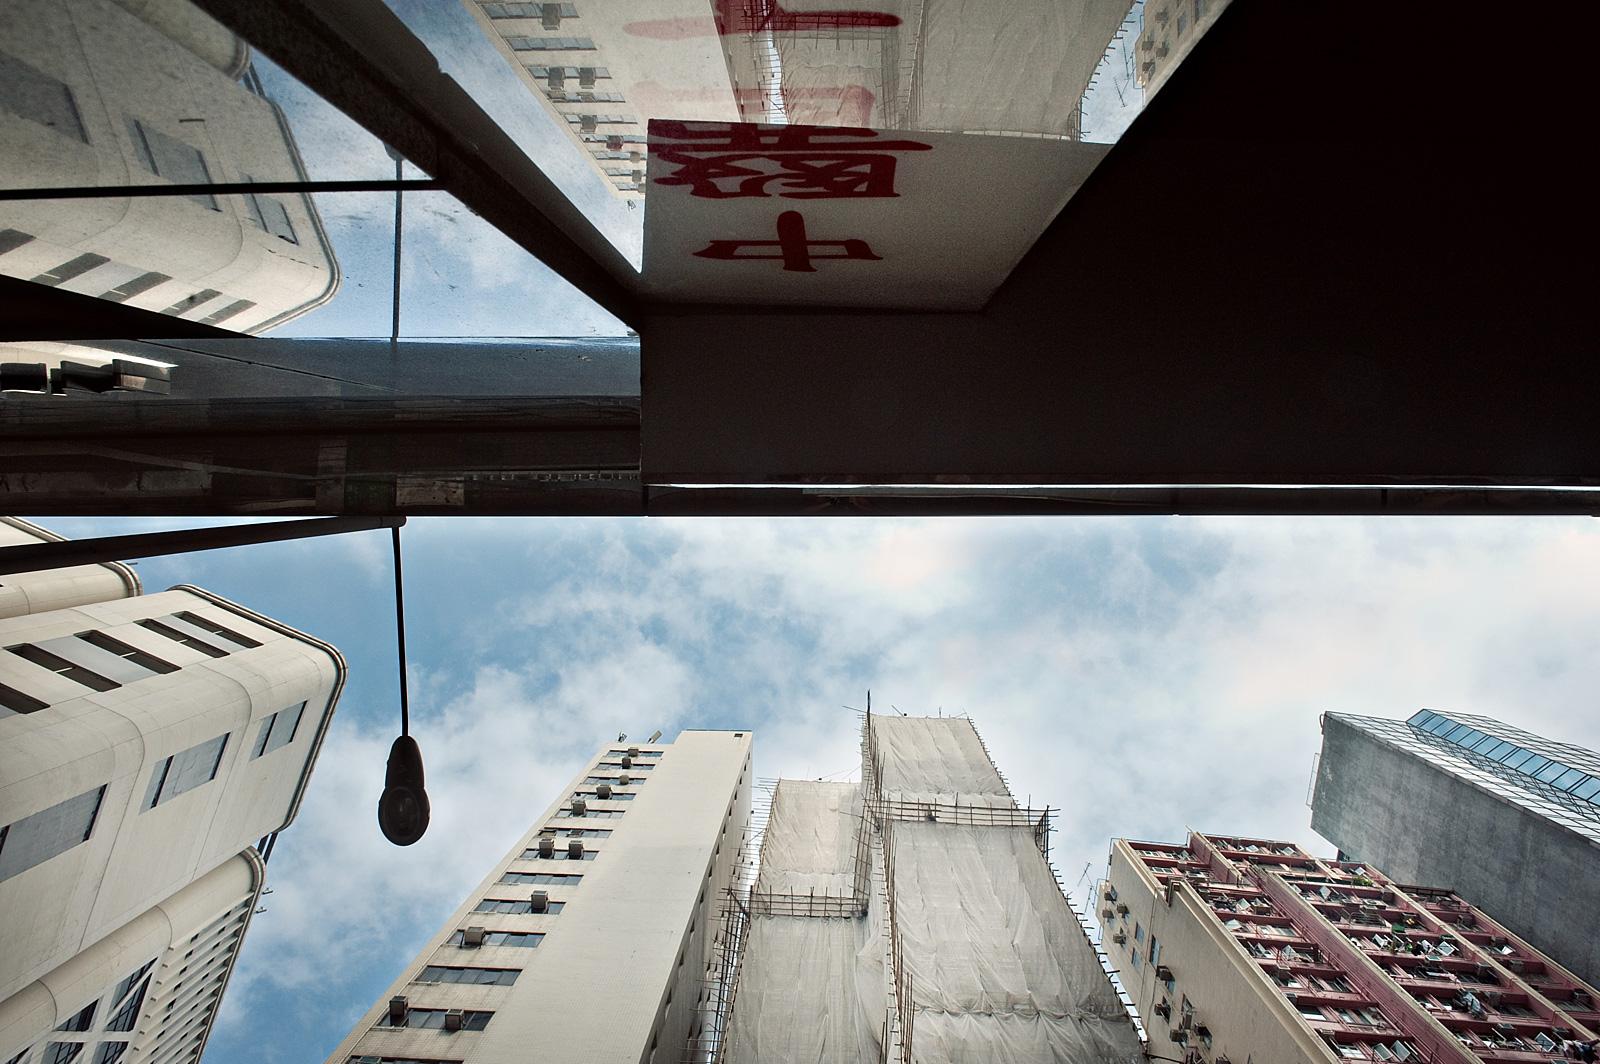 Hong-Kong-KZN-Photographer-Jacki-Bruniquel-01